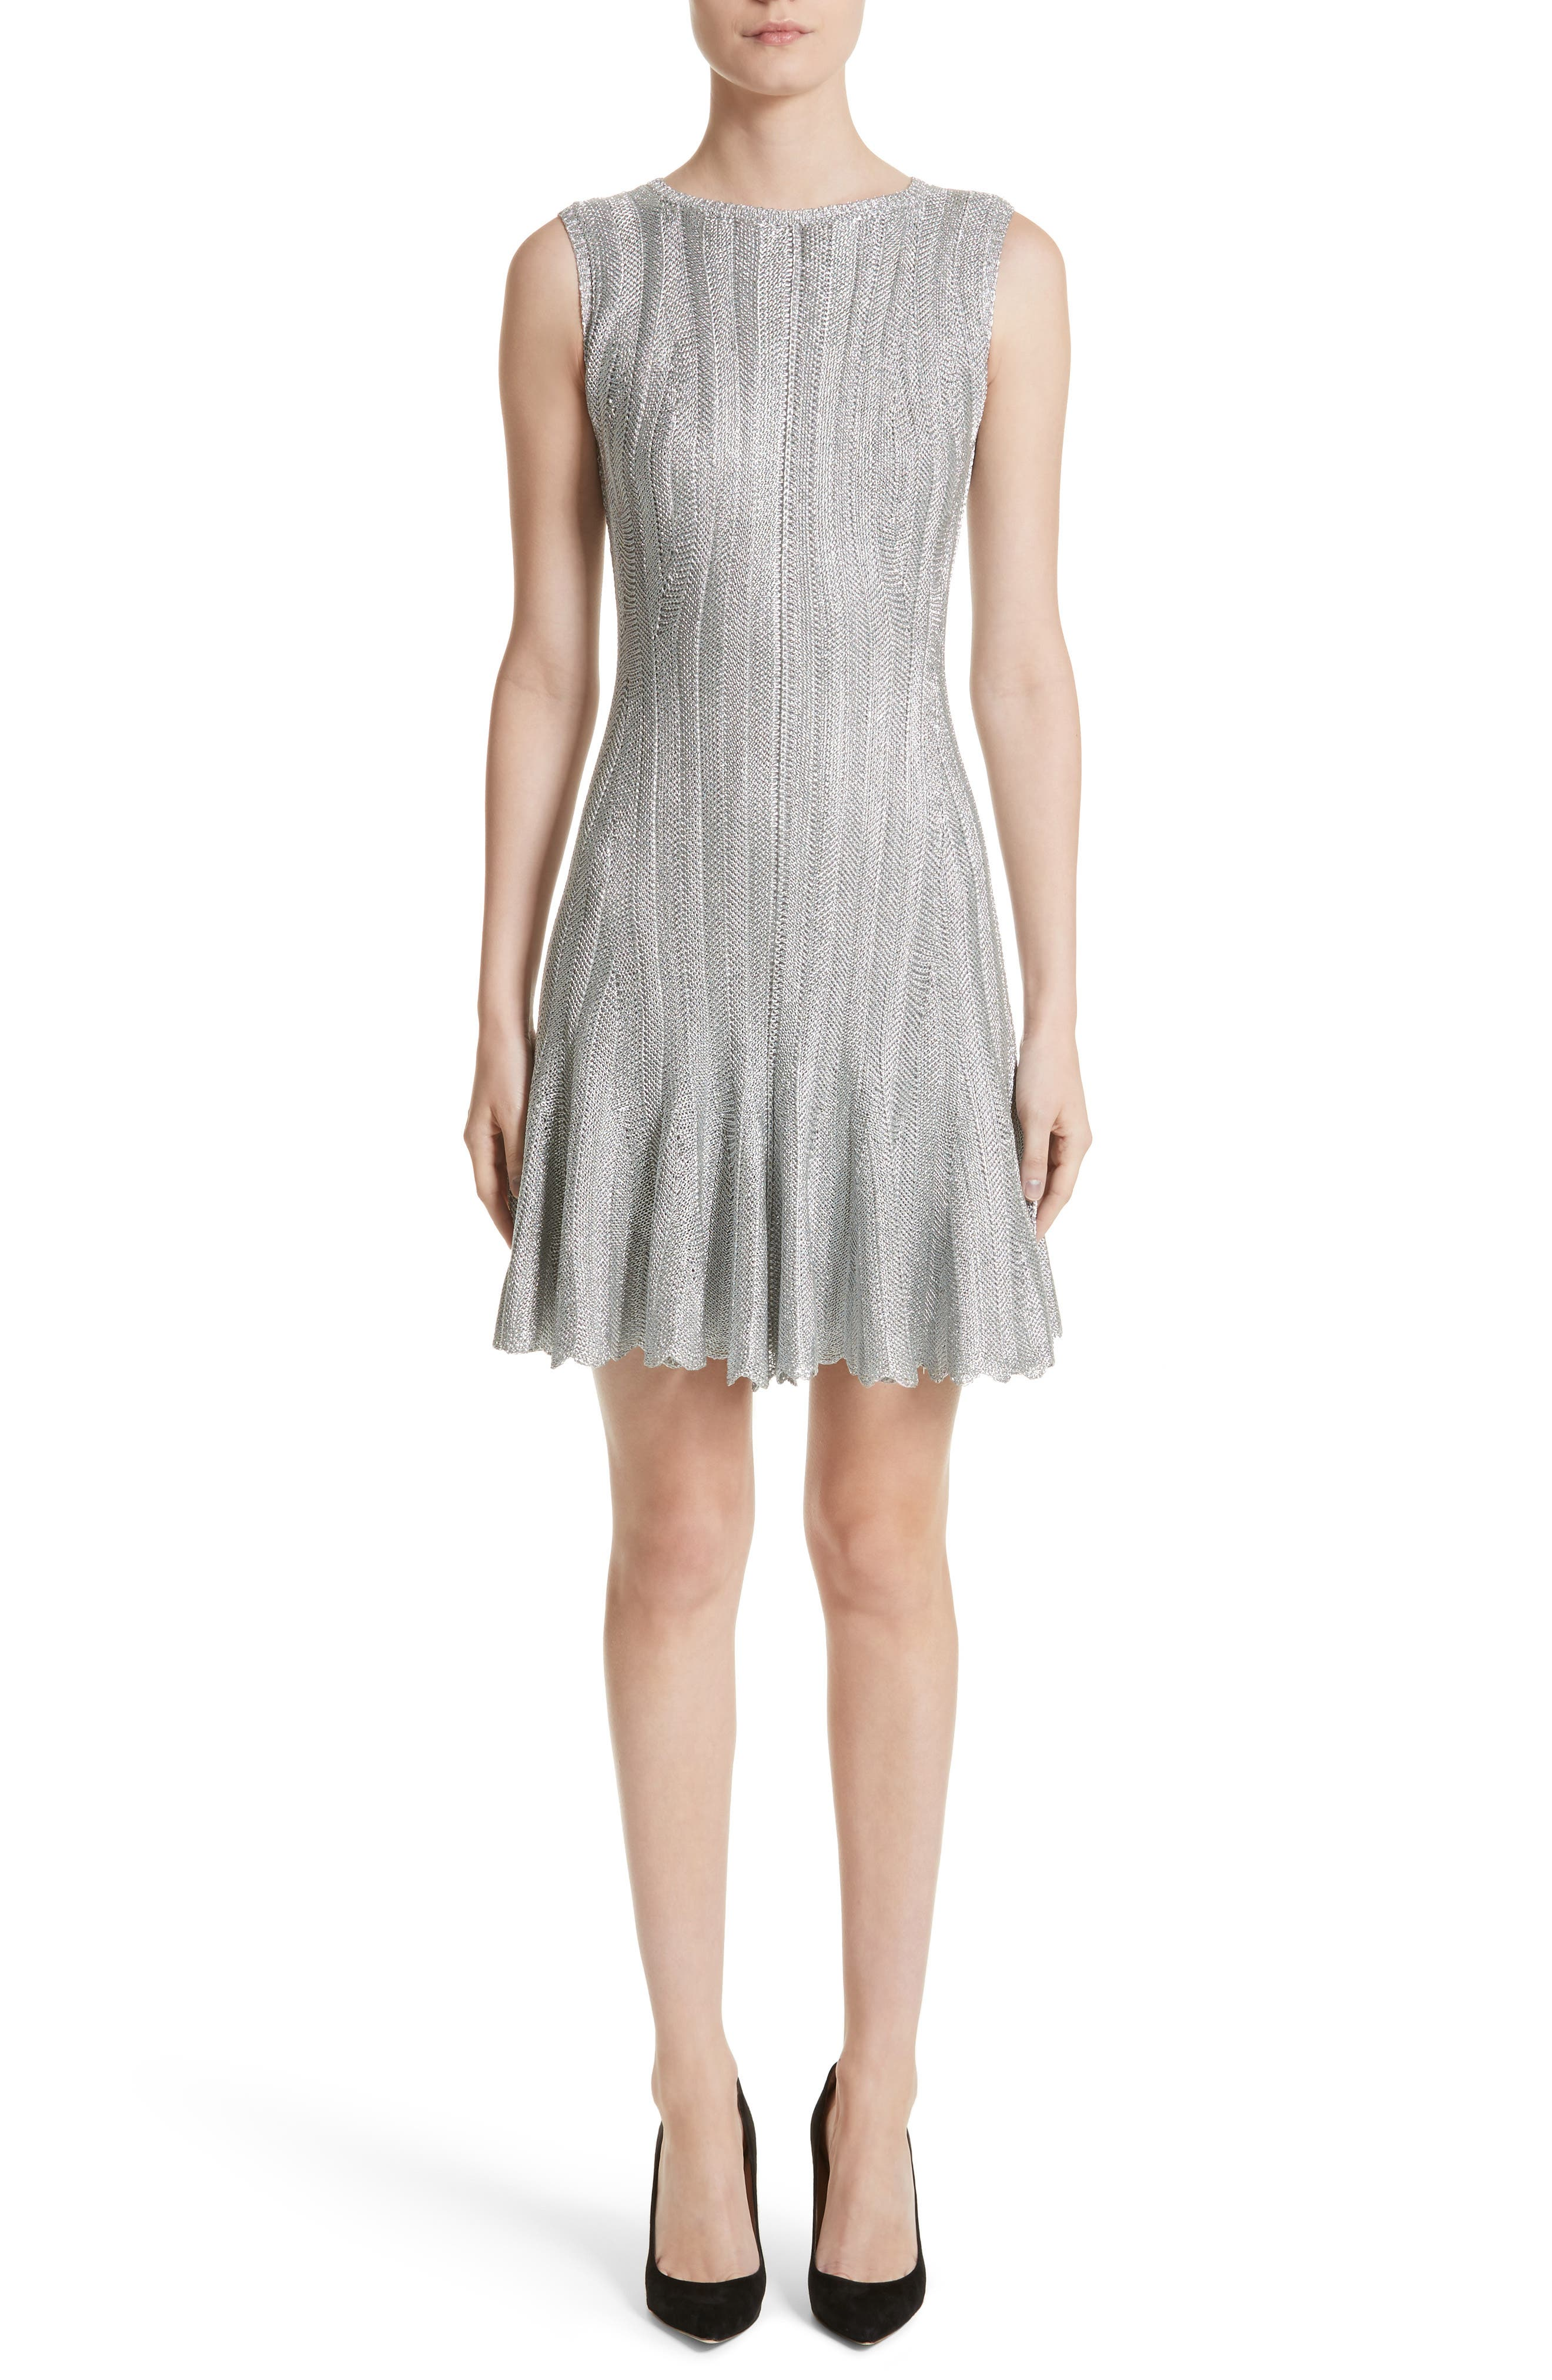 Main Image - Alexander McQueen Metallic Knit Fit & Flare Dress